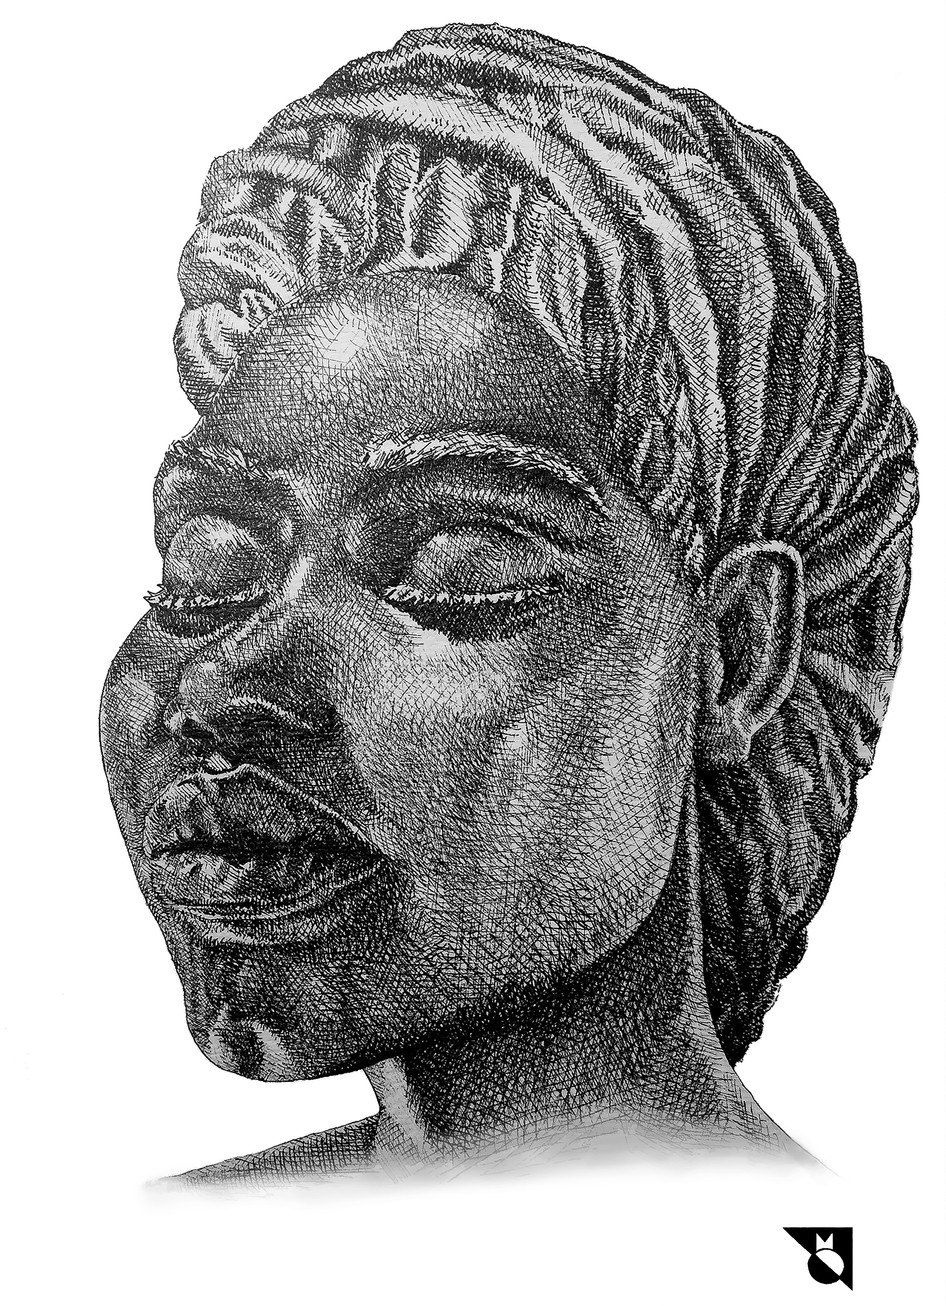 Samuel Lind sculpture